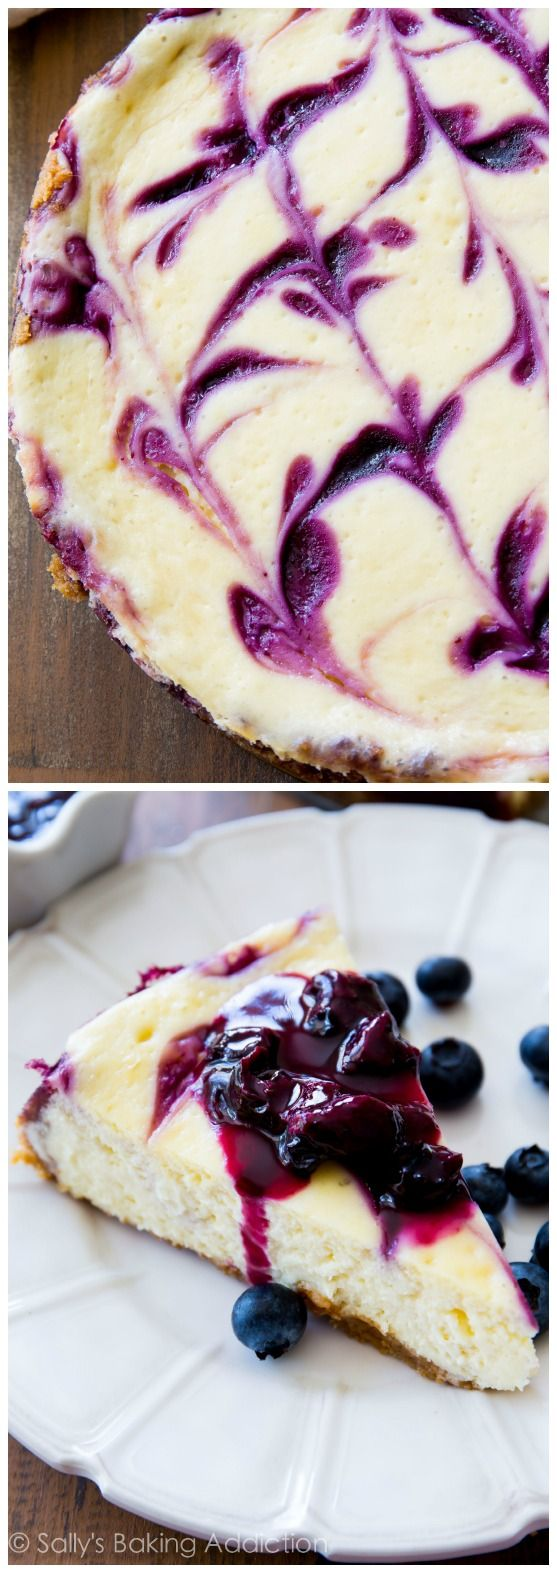 Ultra creamy homemade cheesecake swirled with a sweet blueberry swirl. All on top of my favorite buttery graham cracker crust! sallysbakinga...